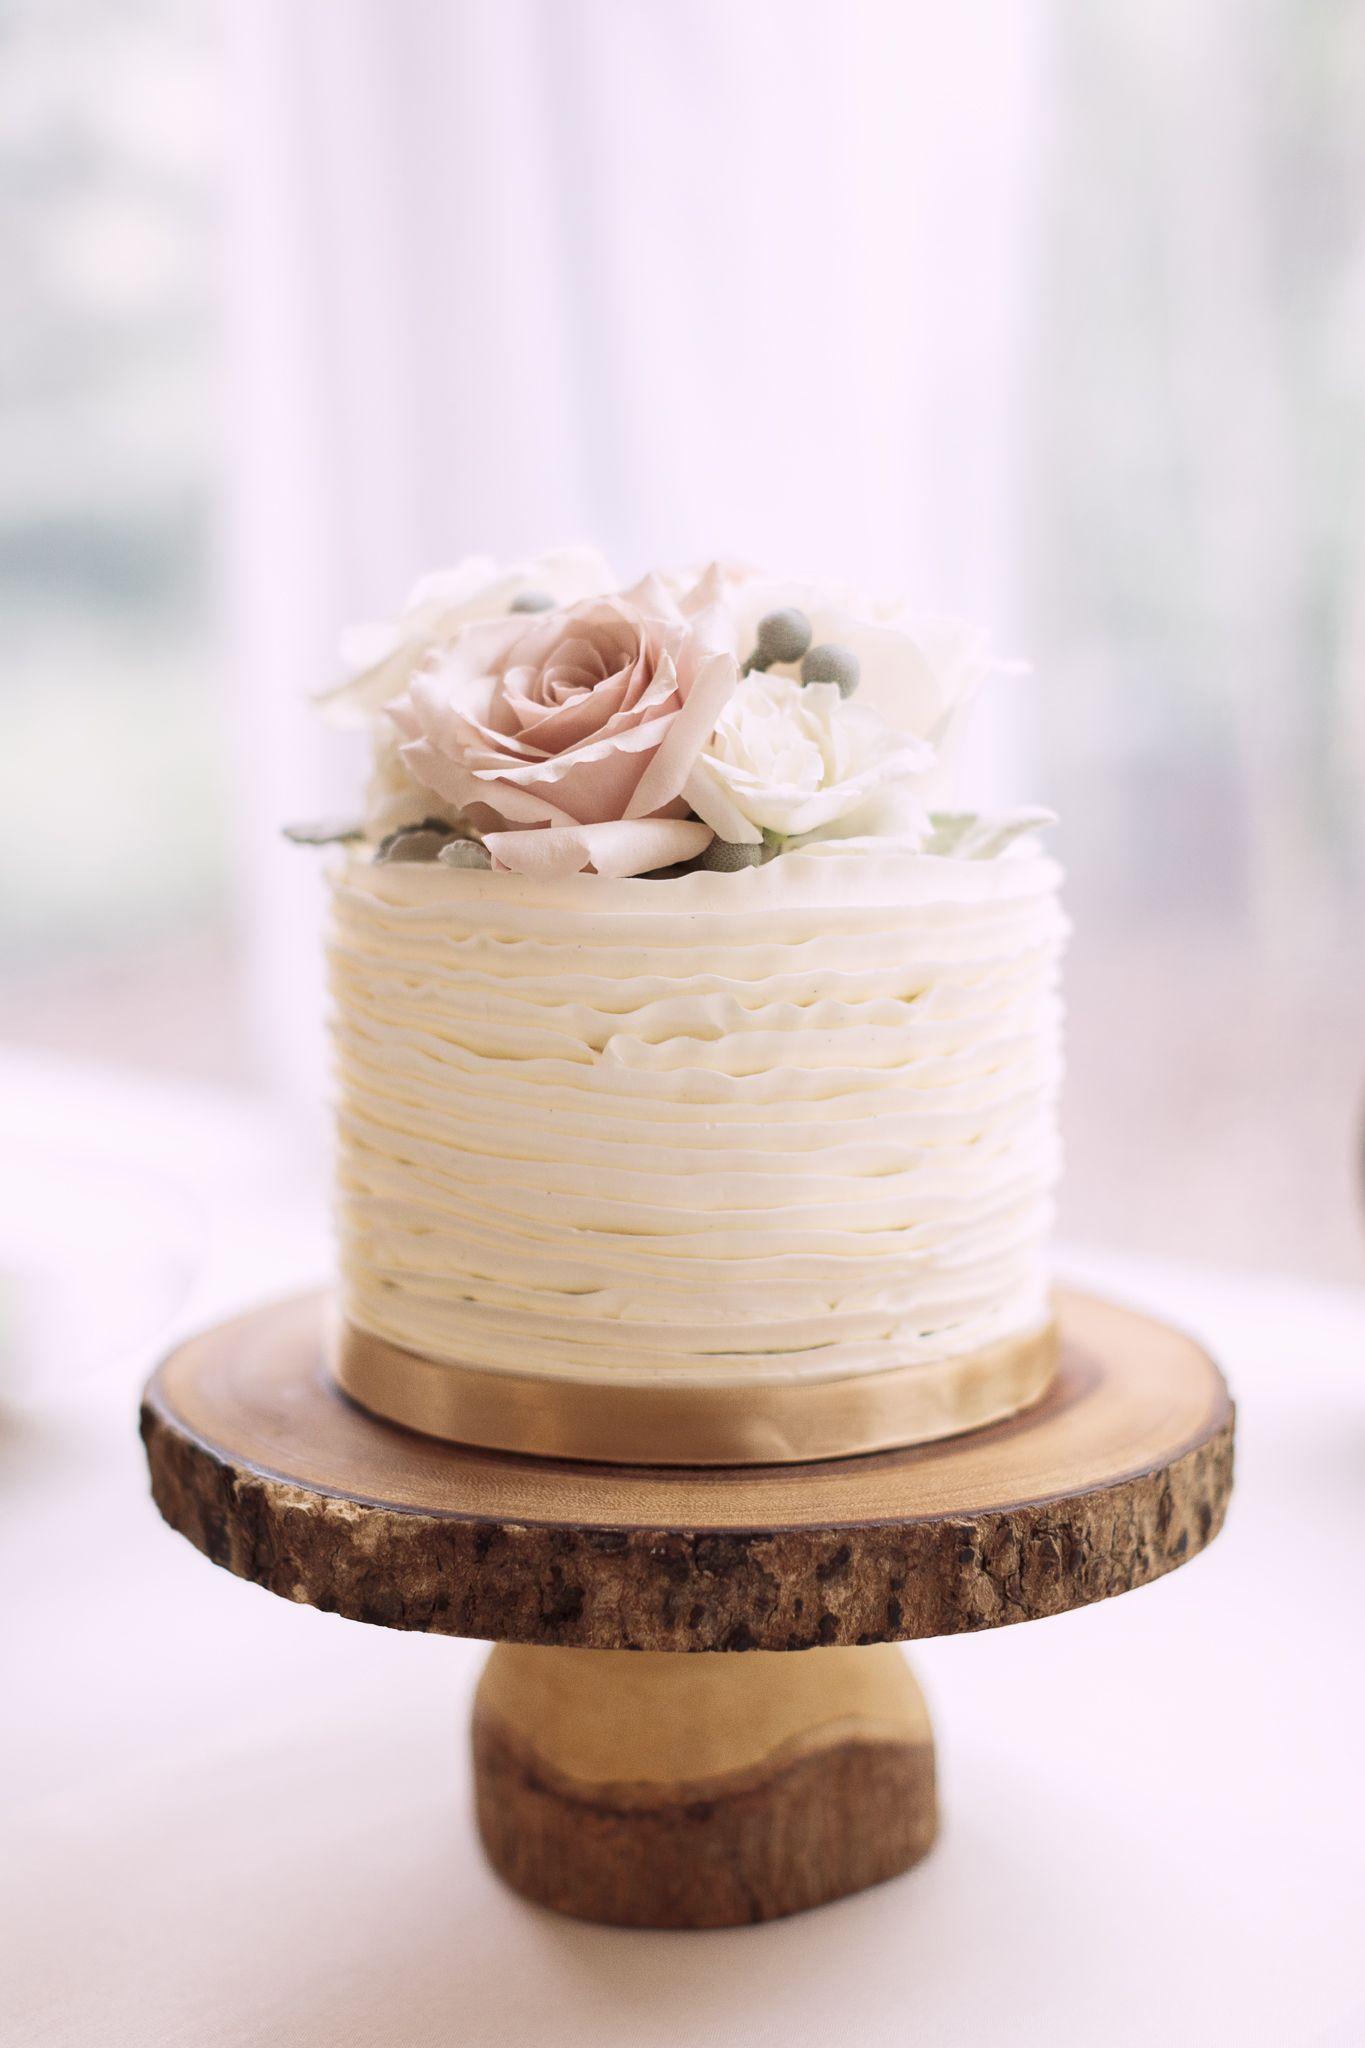 Blush Flower Cake Www Nicolesarah Com Ombre Cake Blush Rosequartz Pink Simple Wedding Cake Wedding Cake Rustic Blush Wedding Cakes